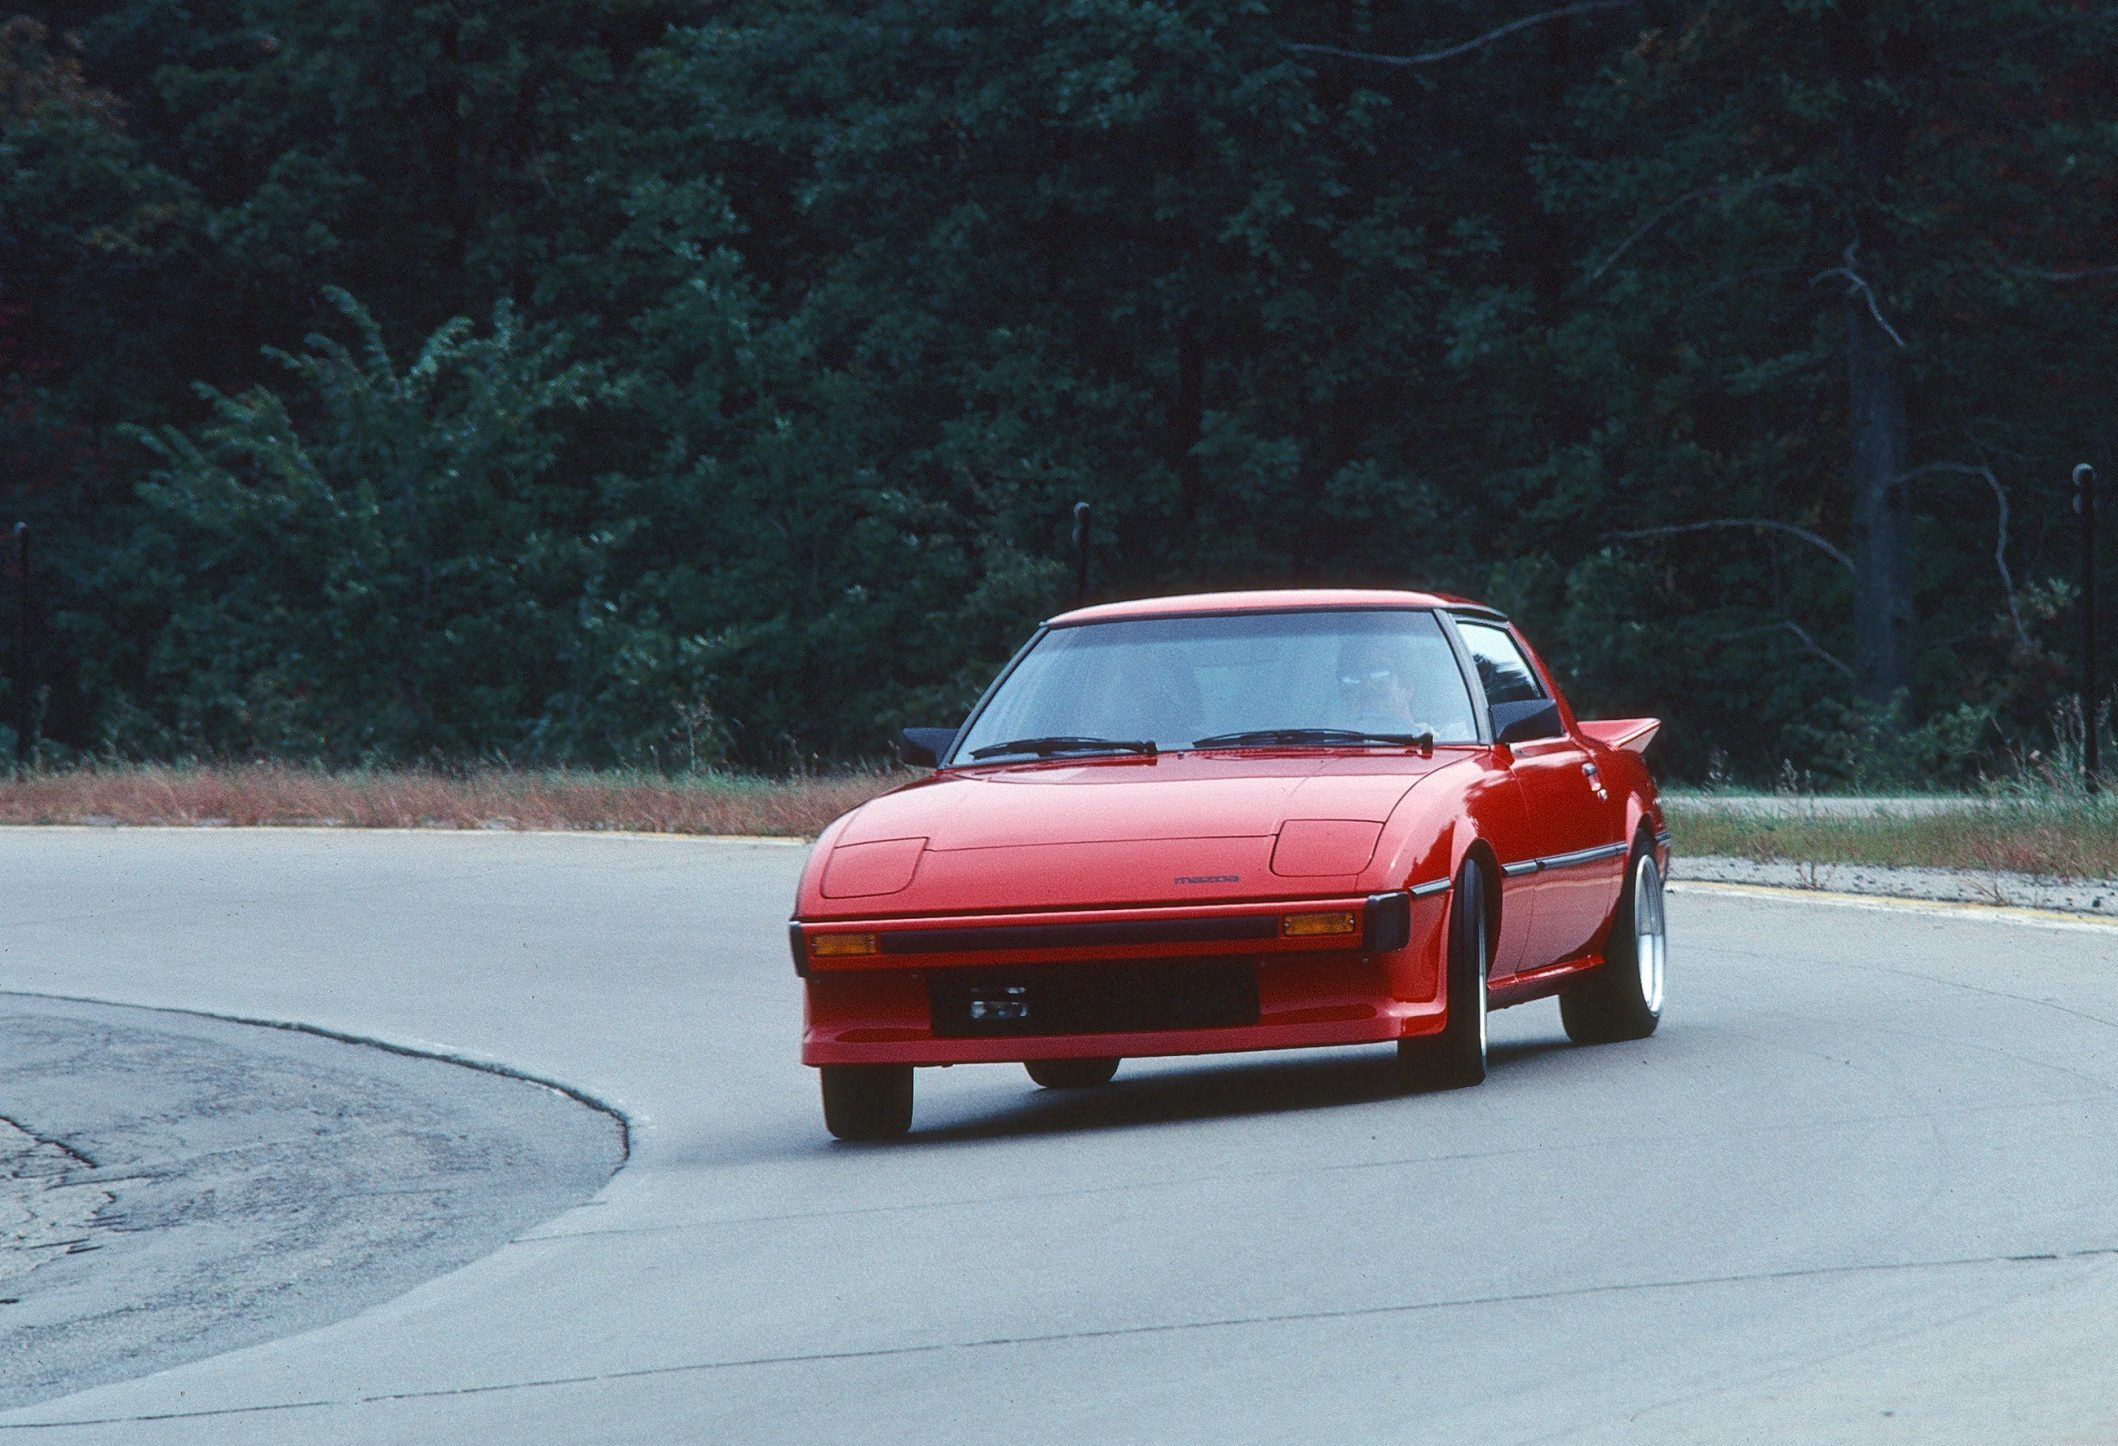 1979 Mazda RX-7 Sherman adventures